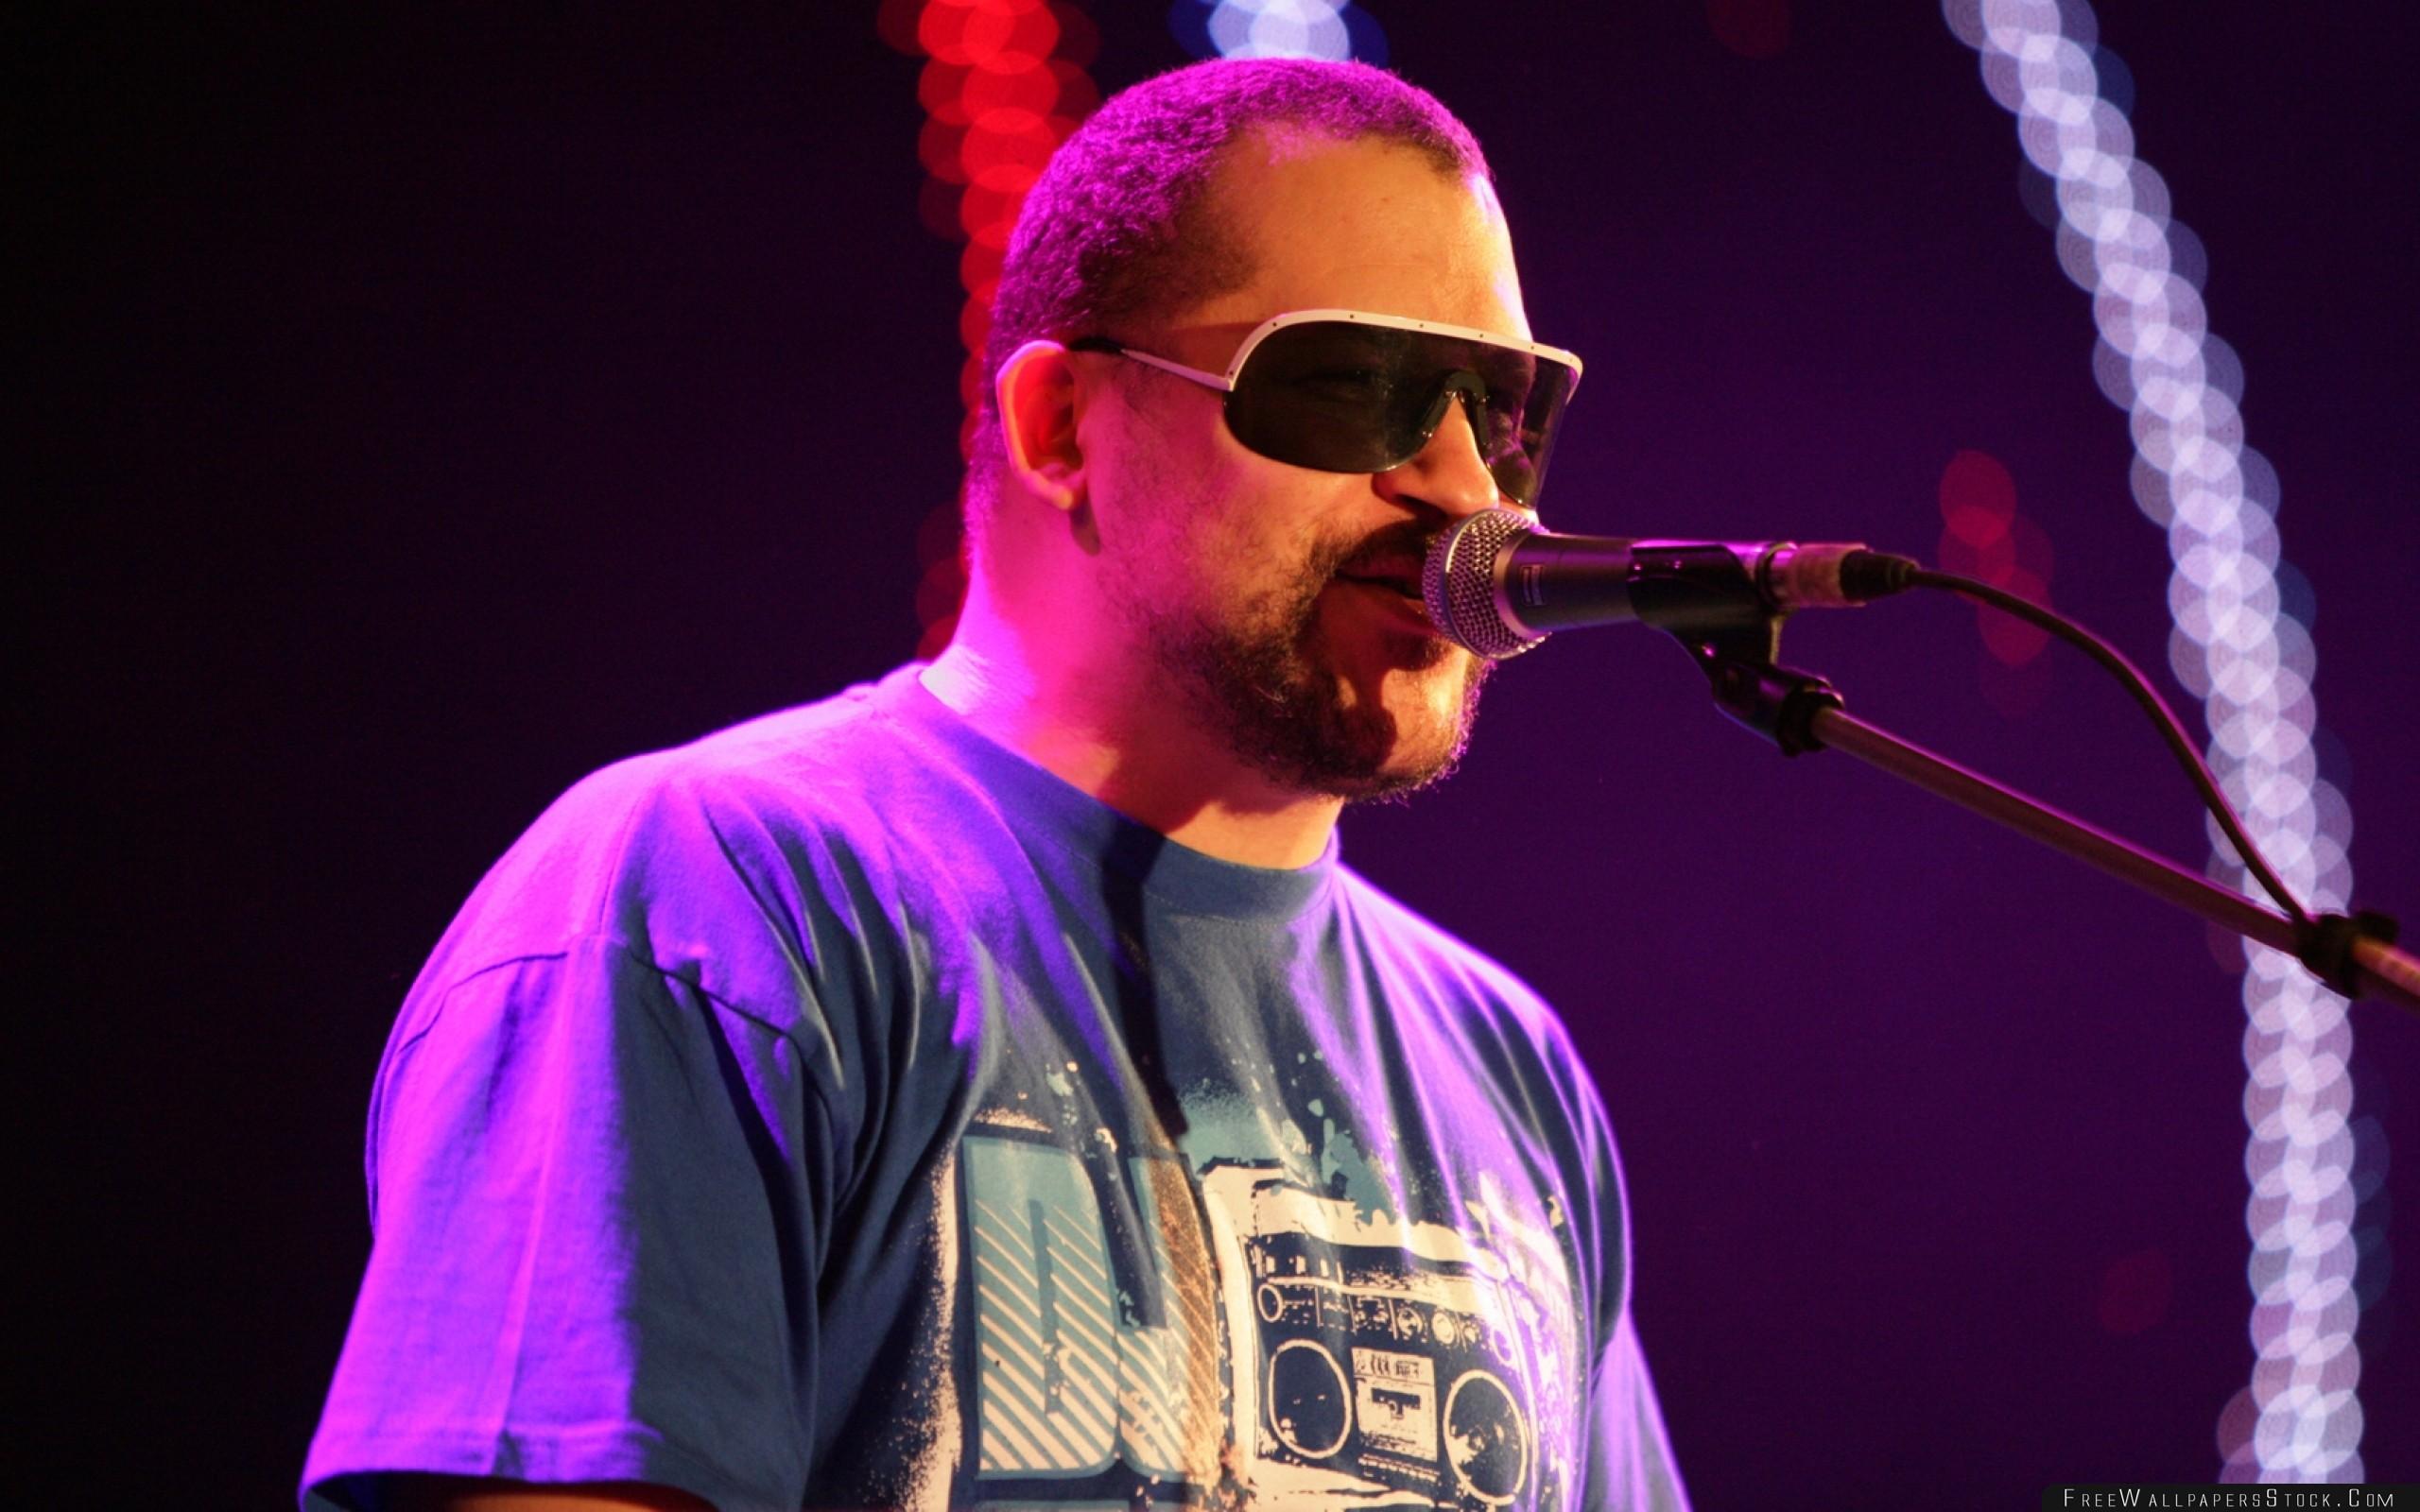 Download Free Wallpaper Torch Glasses   Shirt Microphone Bristle